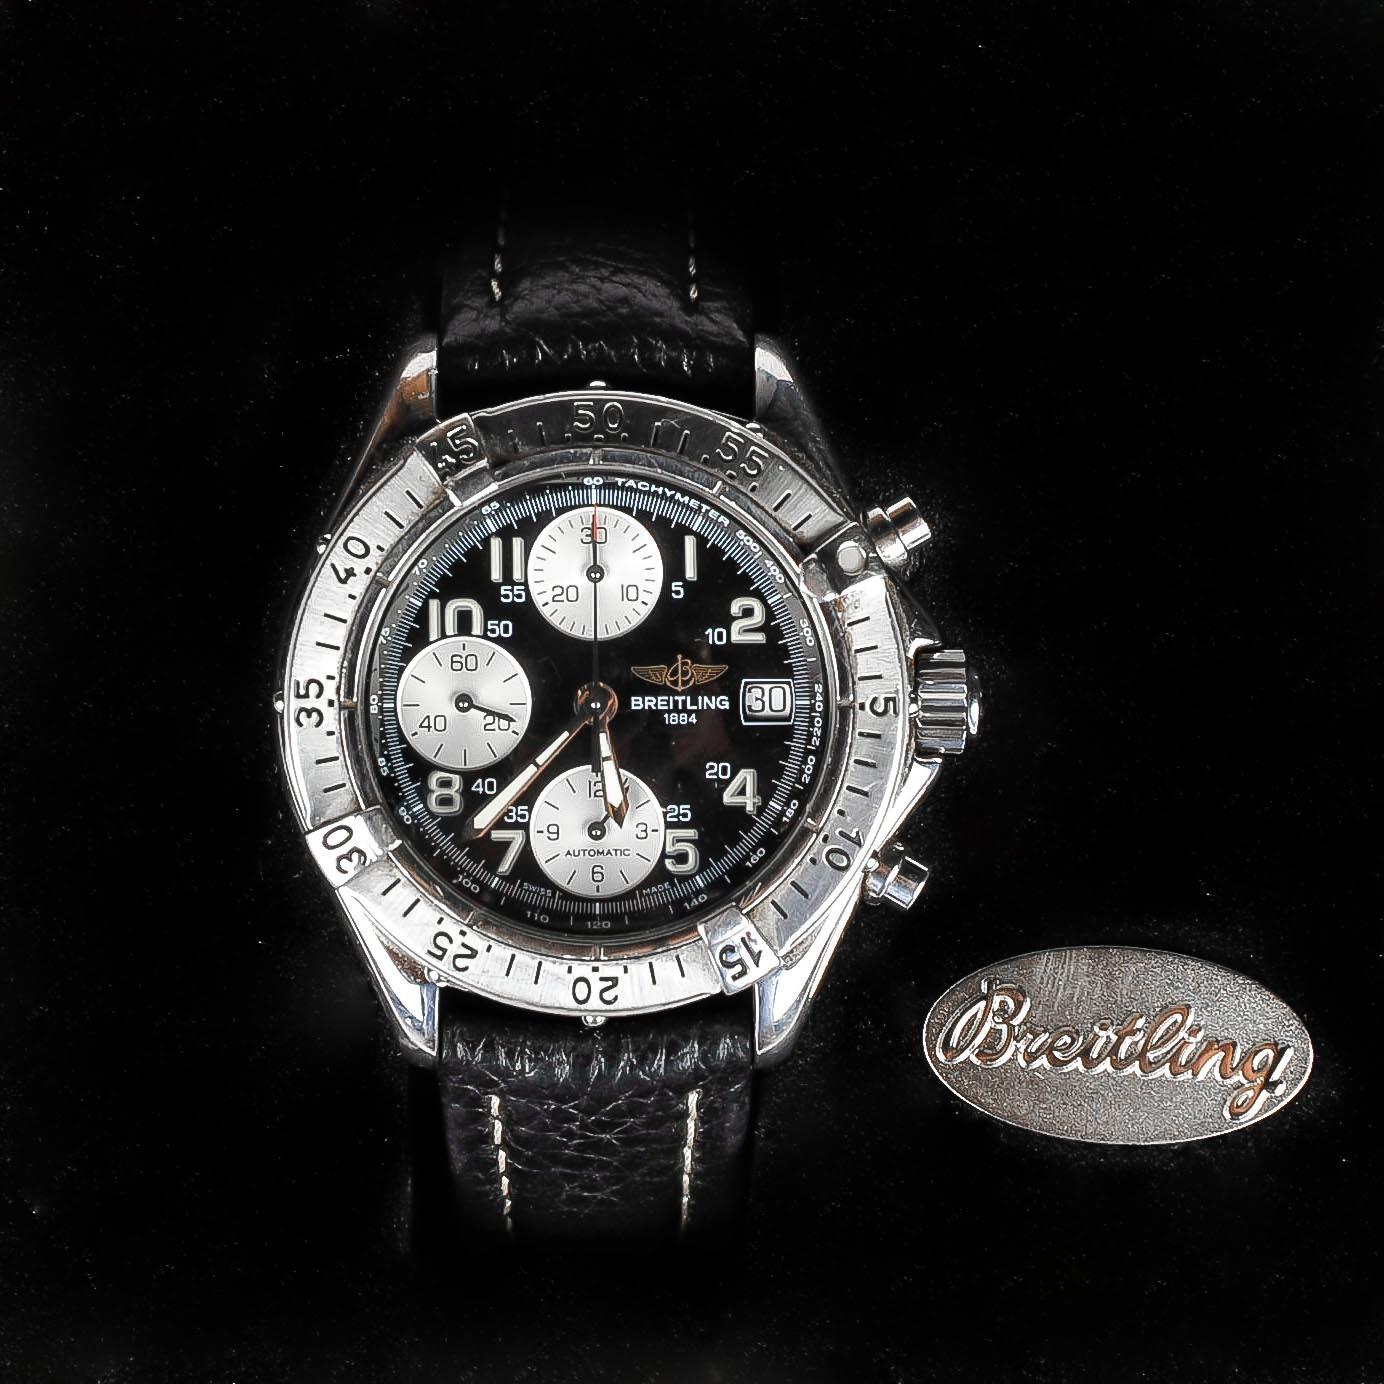 Men's Breitling Colt Chronograph Wrist Watch